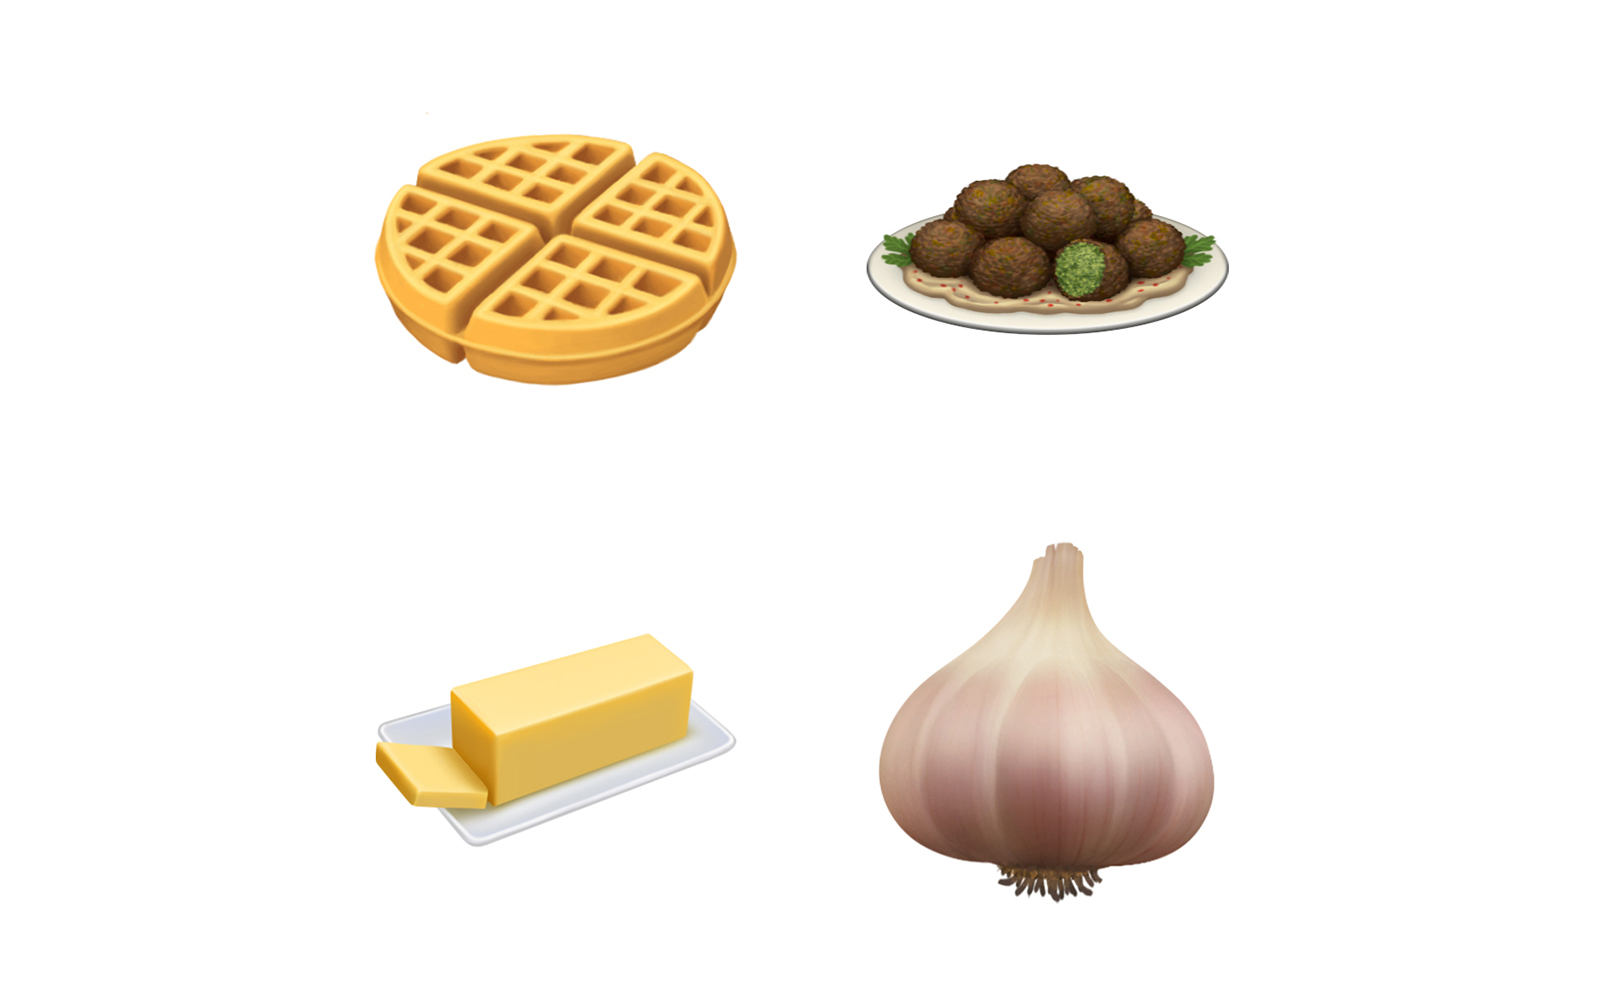 The Worst-Faith Interpretations of Apple's New Food Emoji